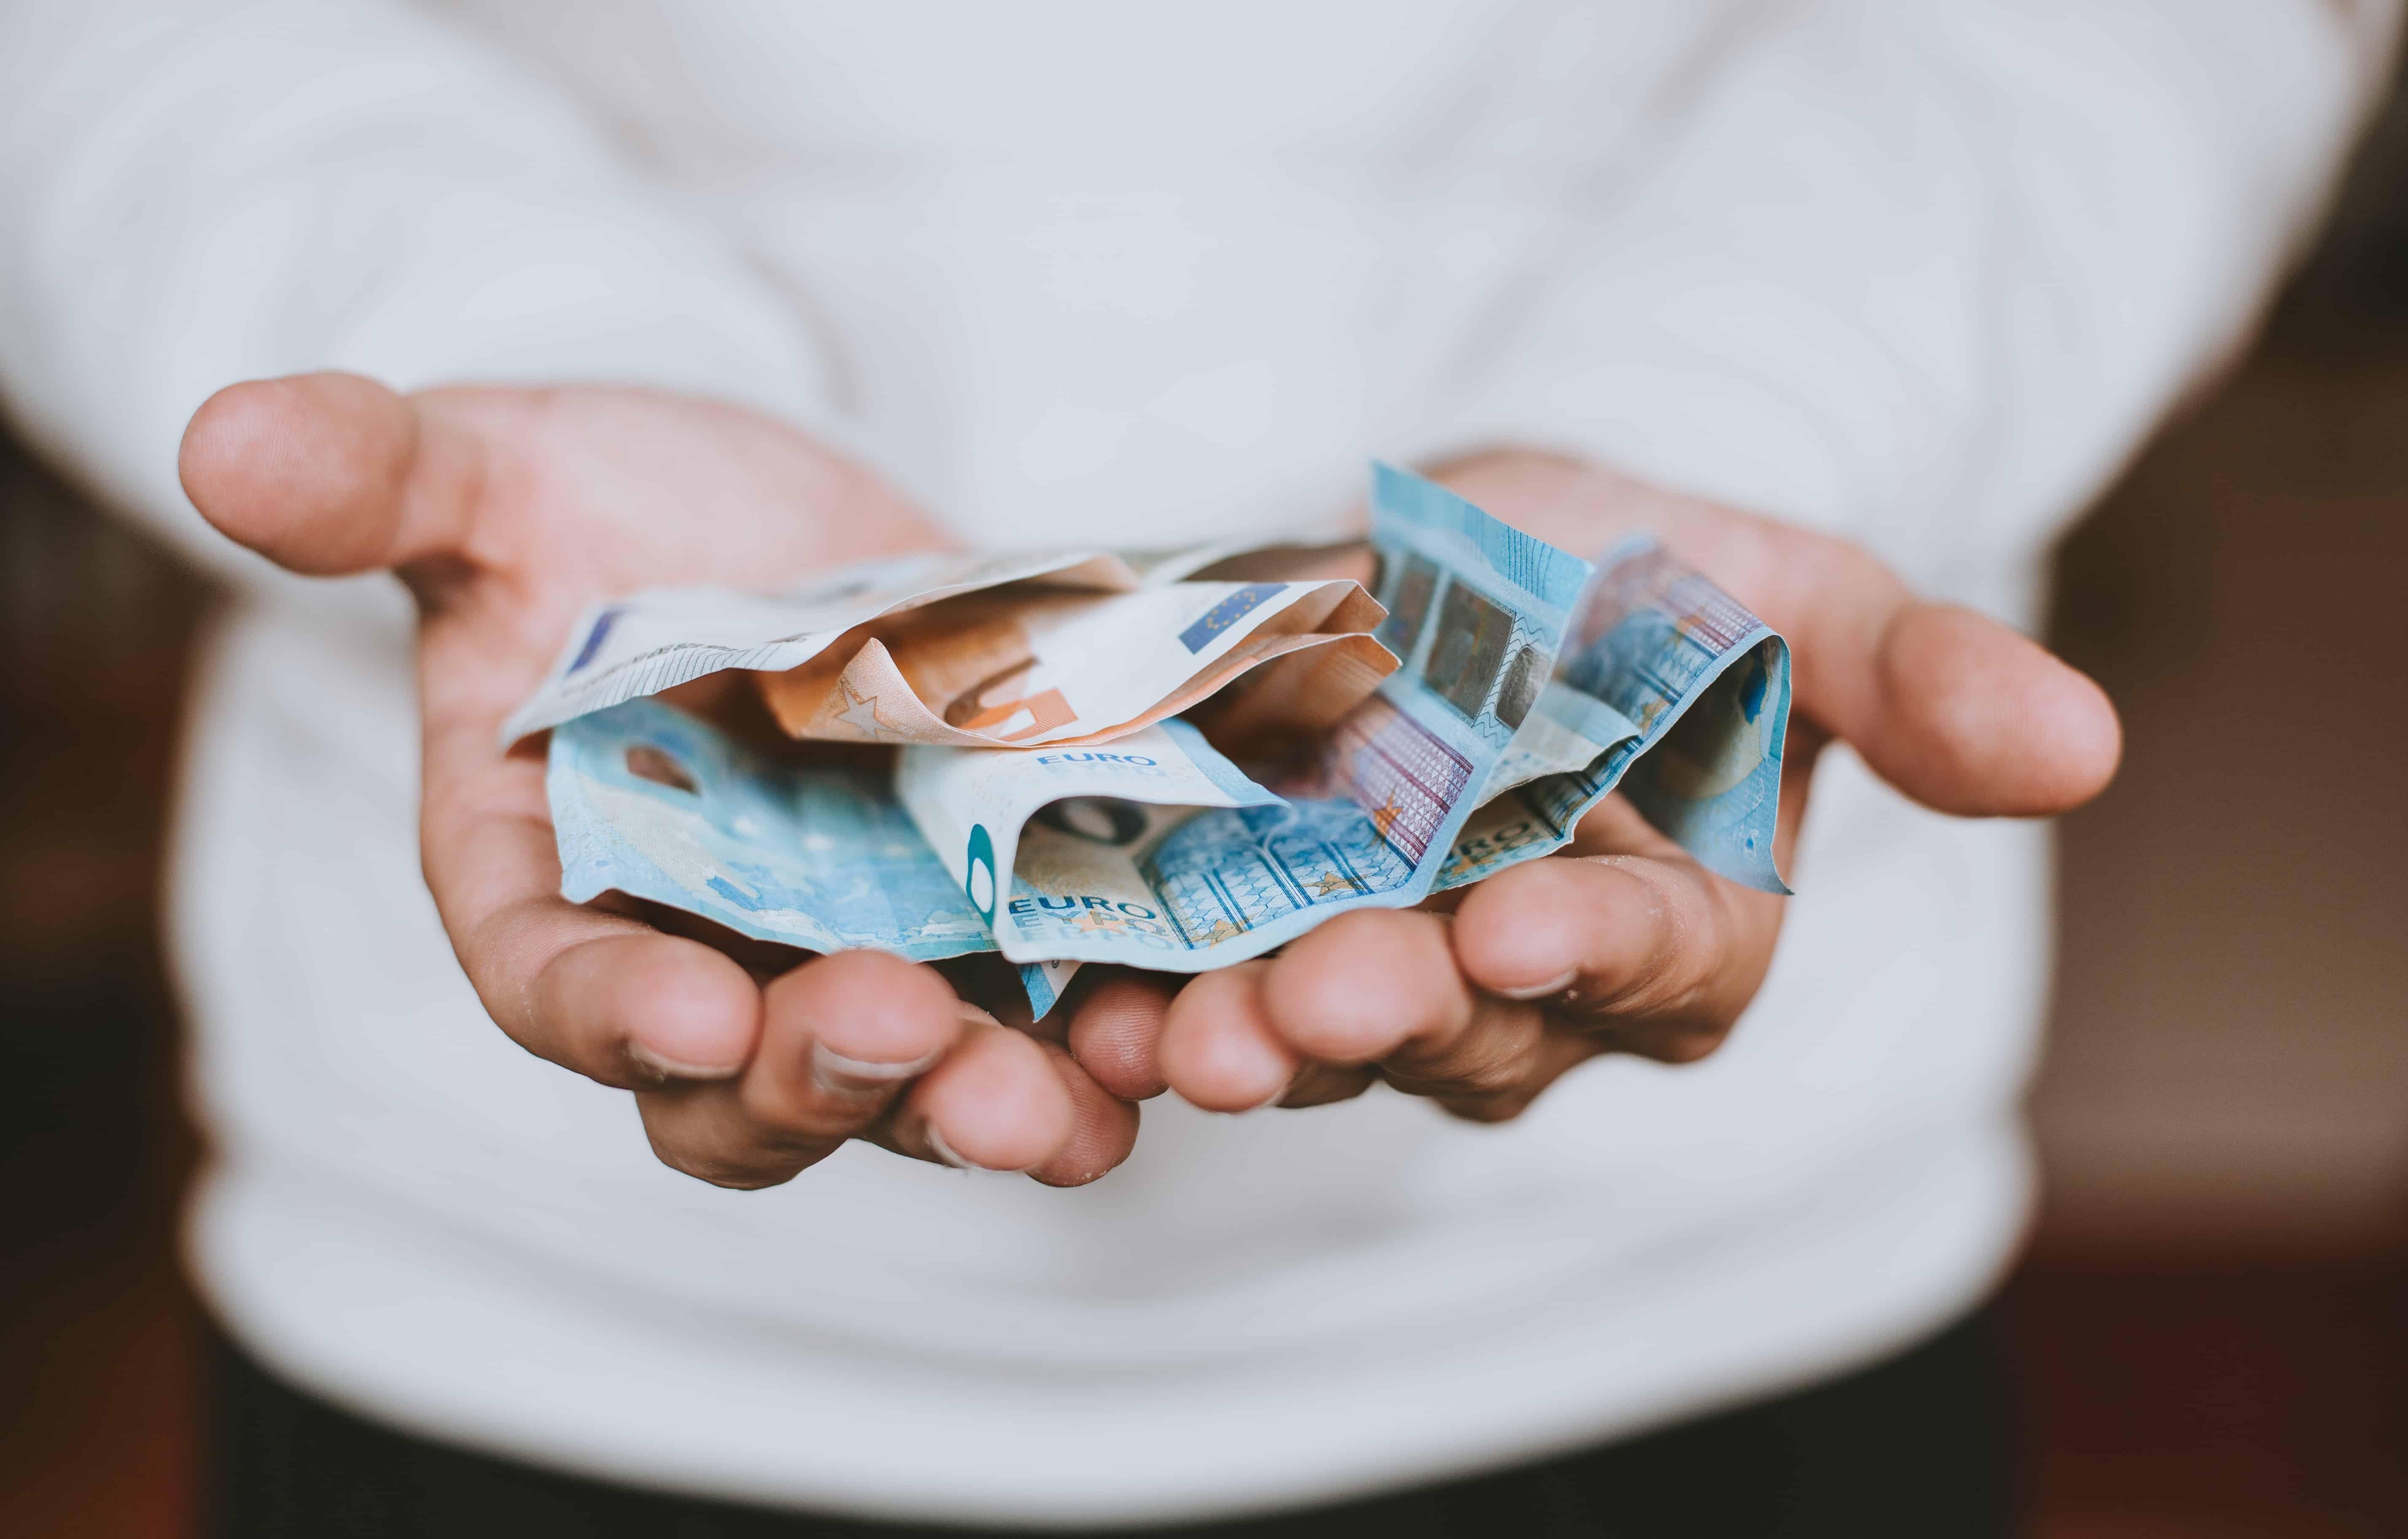 câștigați bani stabili pe Internet